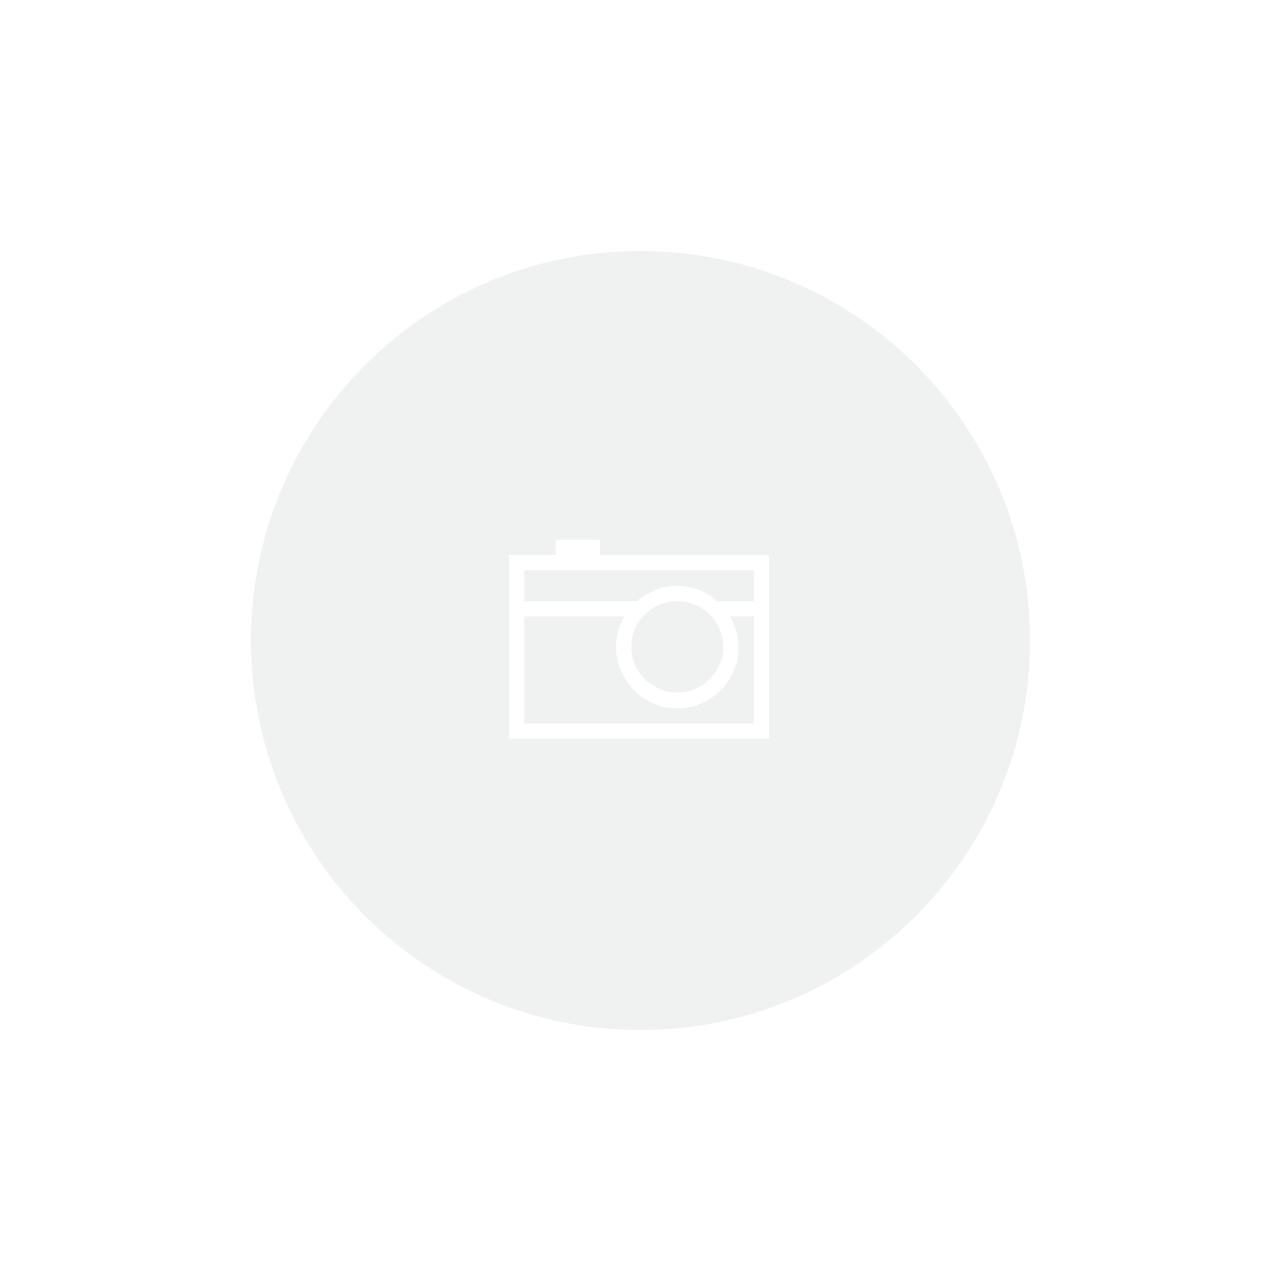 Papel Artesanal Indiano - Ref. 36